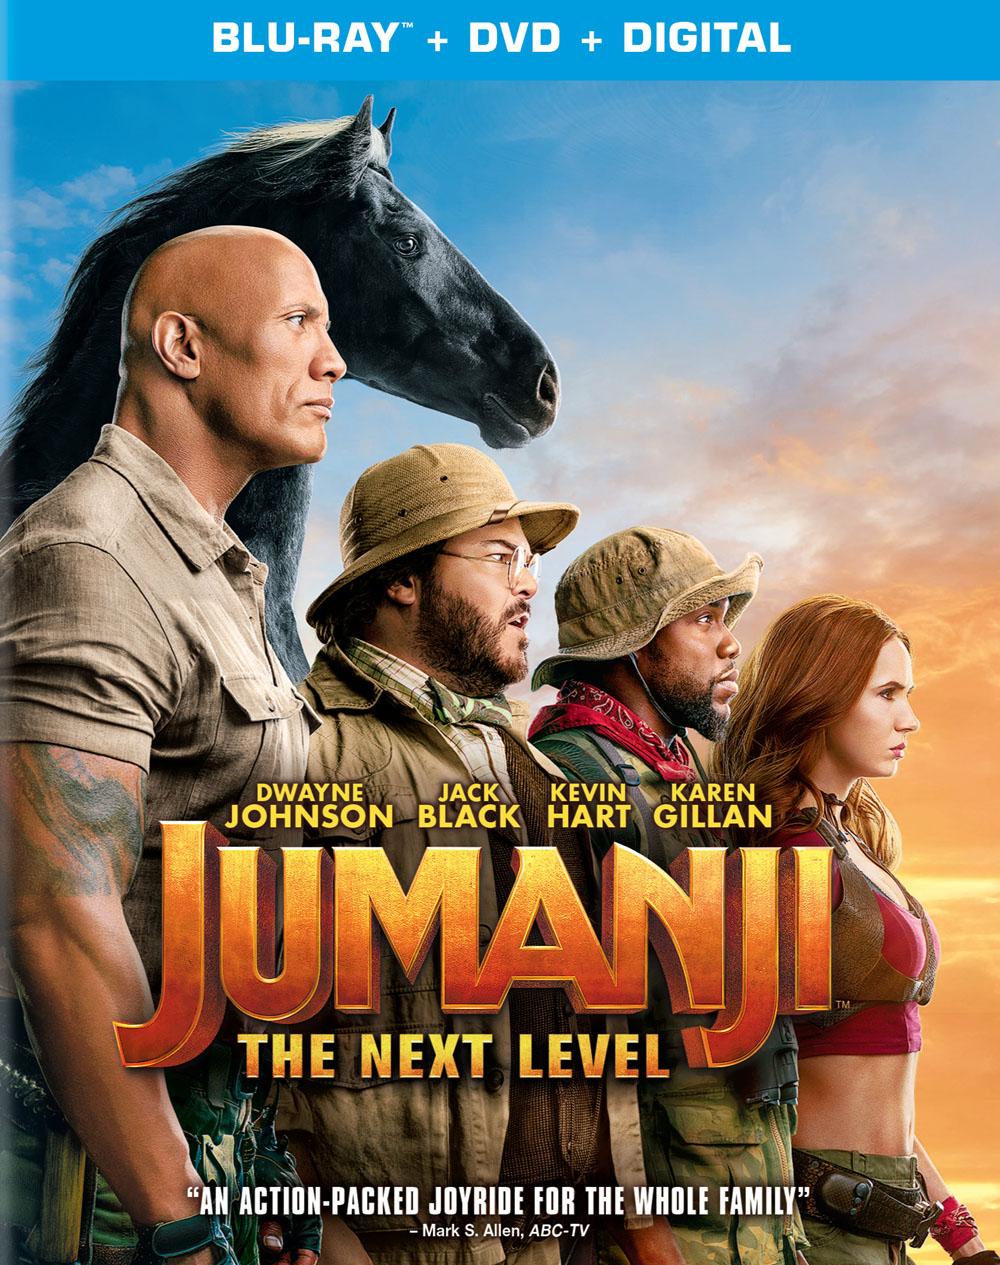 Jumanji: The Next Level Blu-ray Review